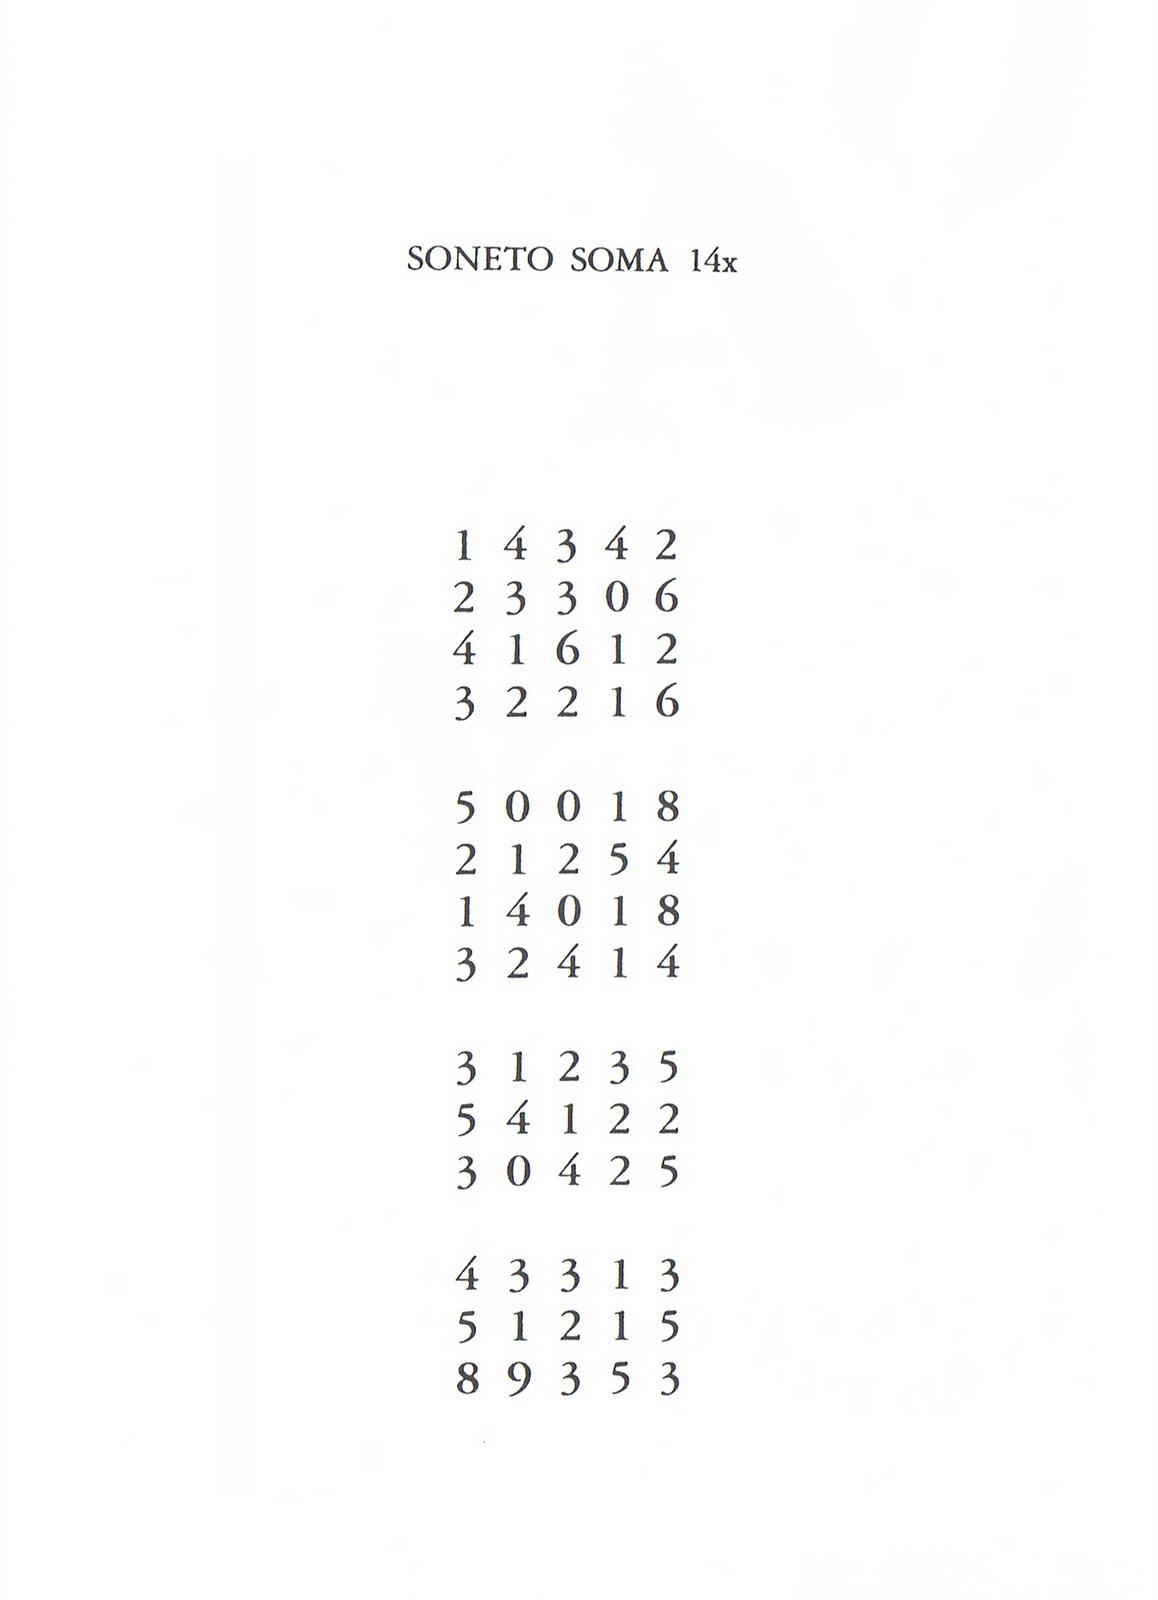 http://3.bp.blogspot.com/_pCR5Z2_dacY/S9bQitb0XmI/AAAAAAAAAGI/7k2U7WegpkE/s1600/E.+M.+de+Melo+e+Castro,+soneto+soma+14x,+1963.jpg